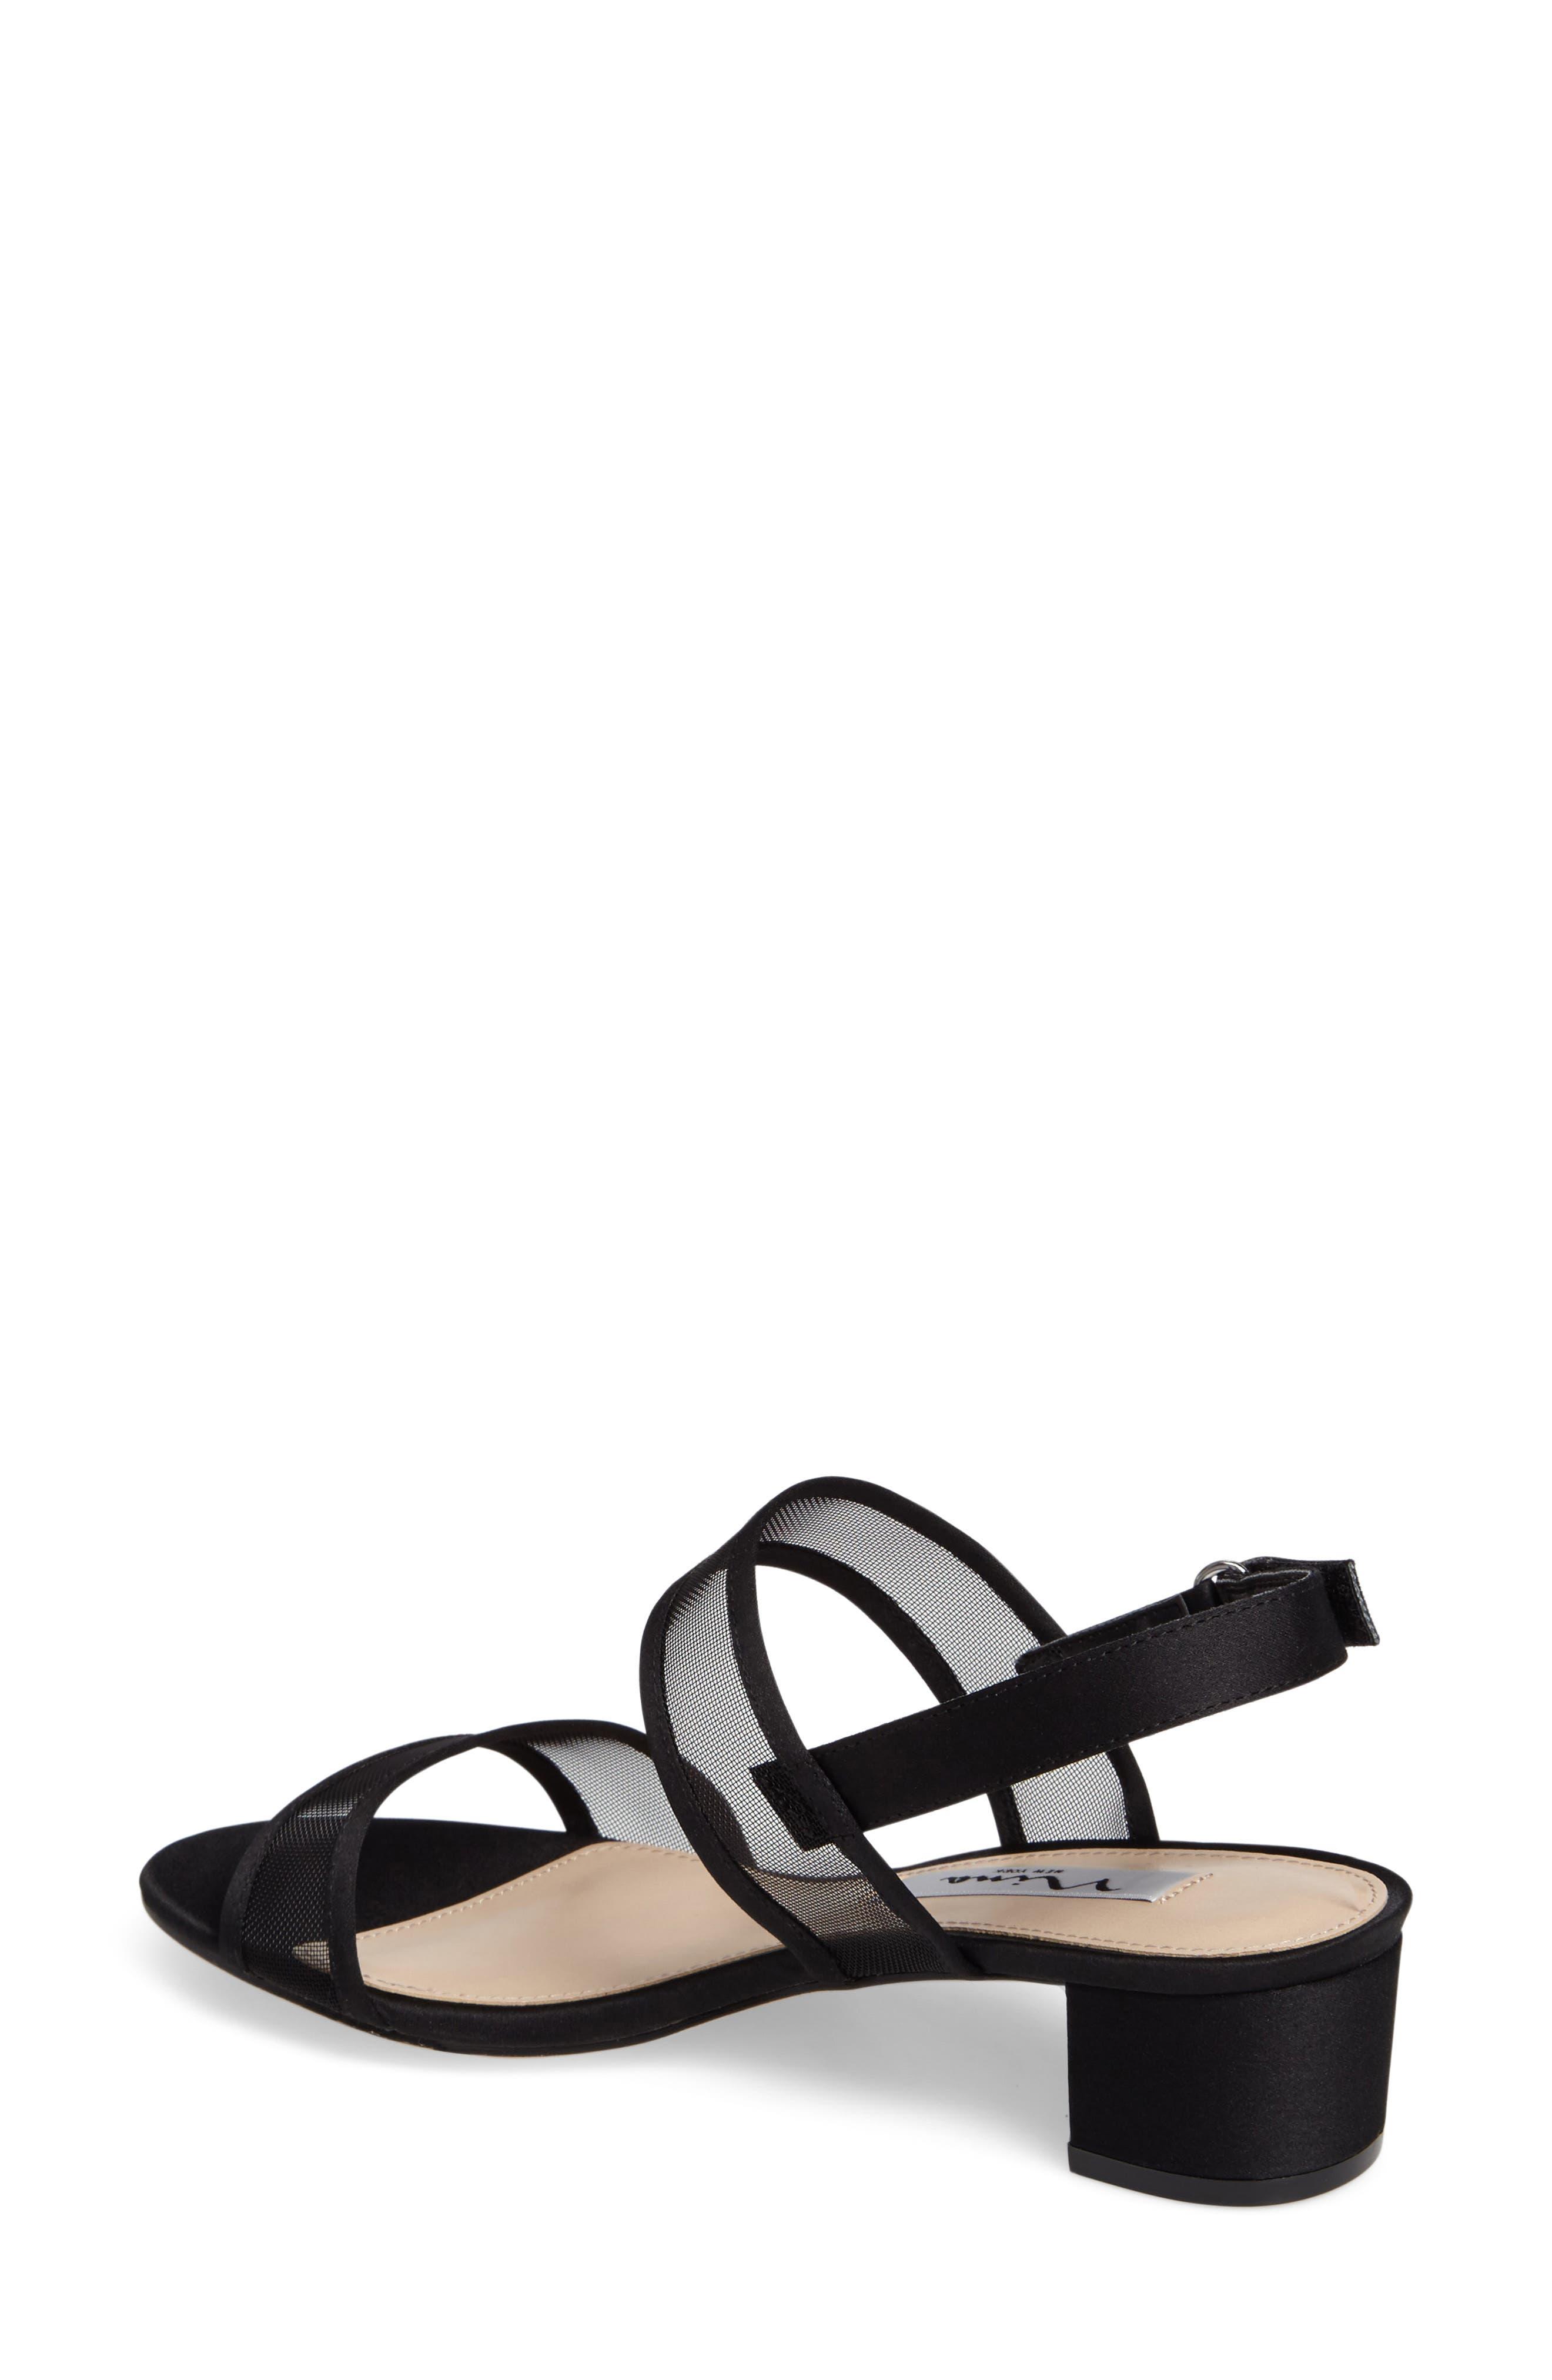 Ganice Mesh Strap Sandal,                             Alternate thumbnail 2, color,                             BLACK SATIN